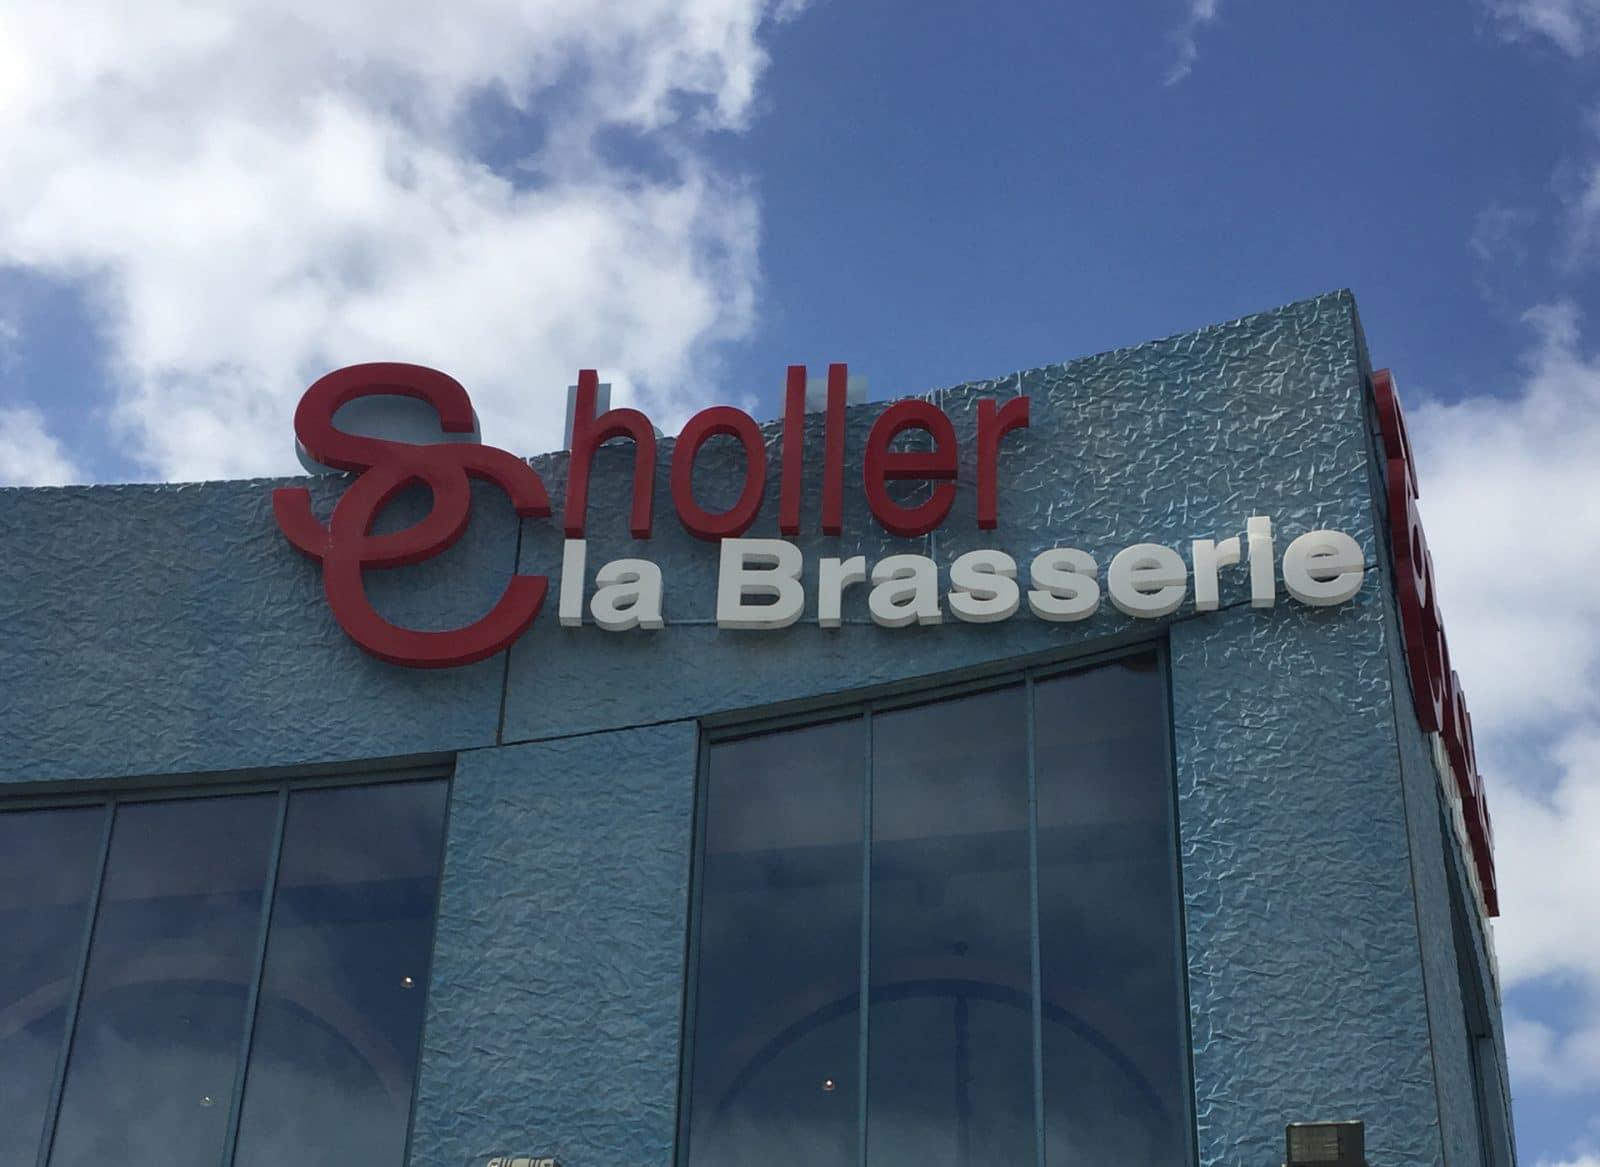 Scholler - La brasserie